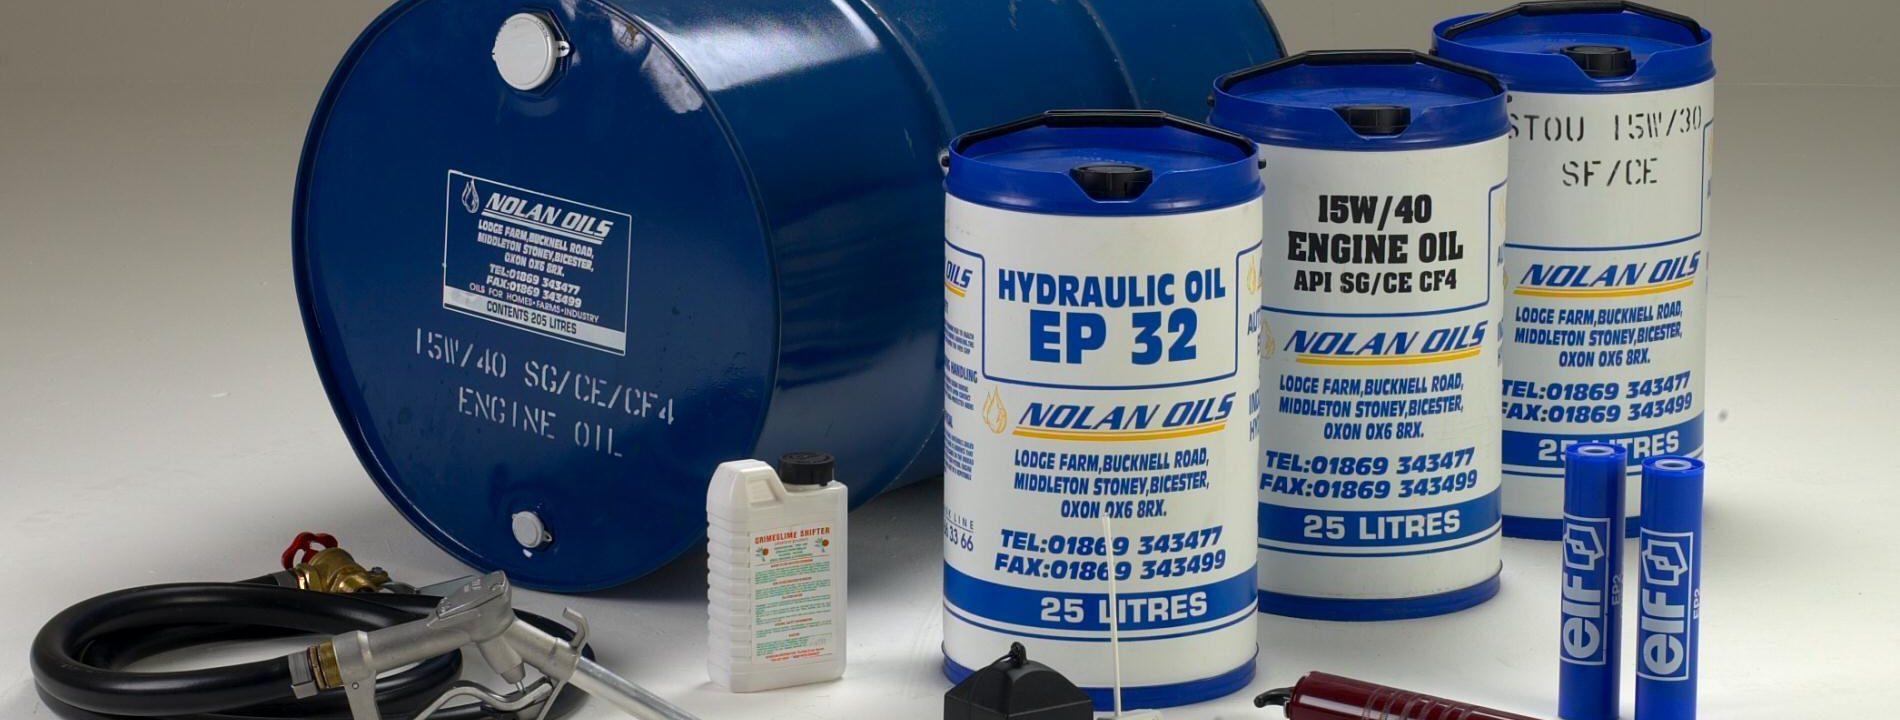 Nolan Oils - Lubricants